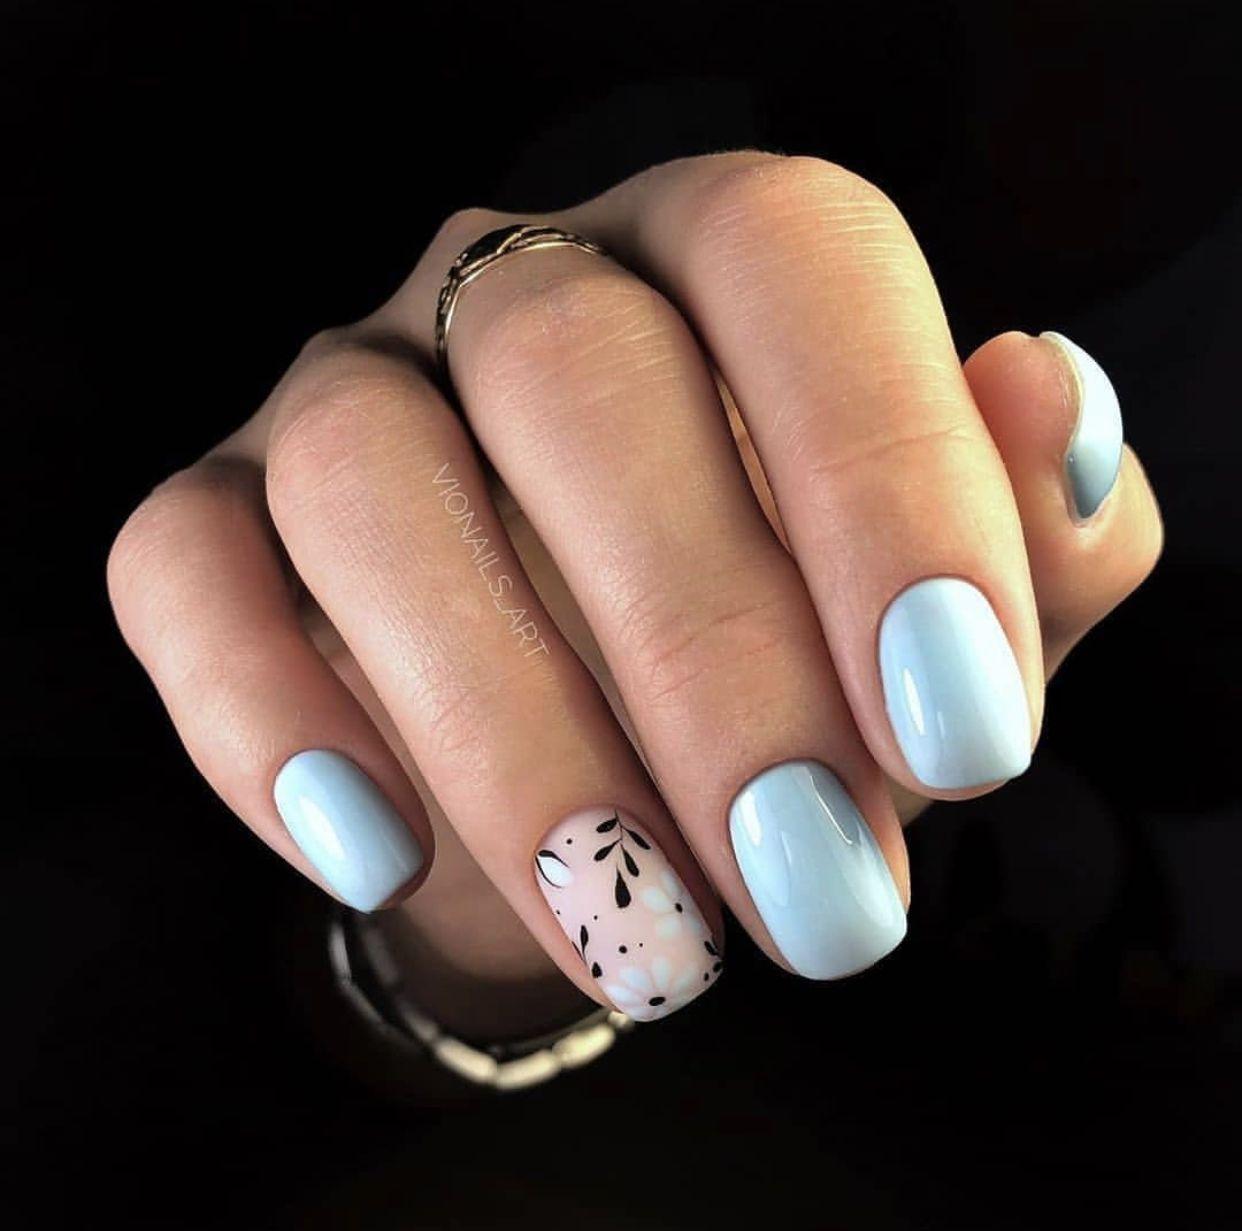 Pin By Marina Papachristodoulou On Nails Short Acrylic Nails